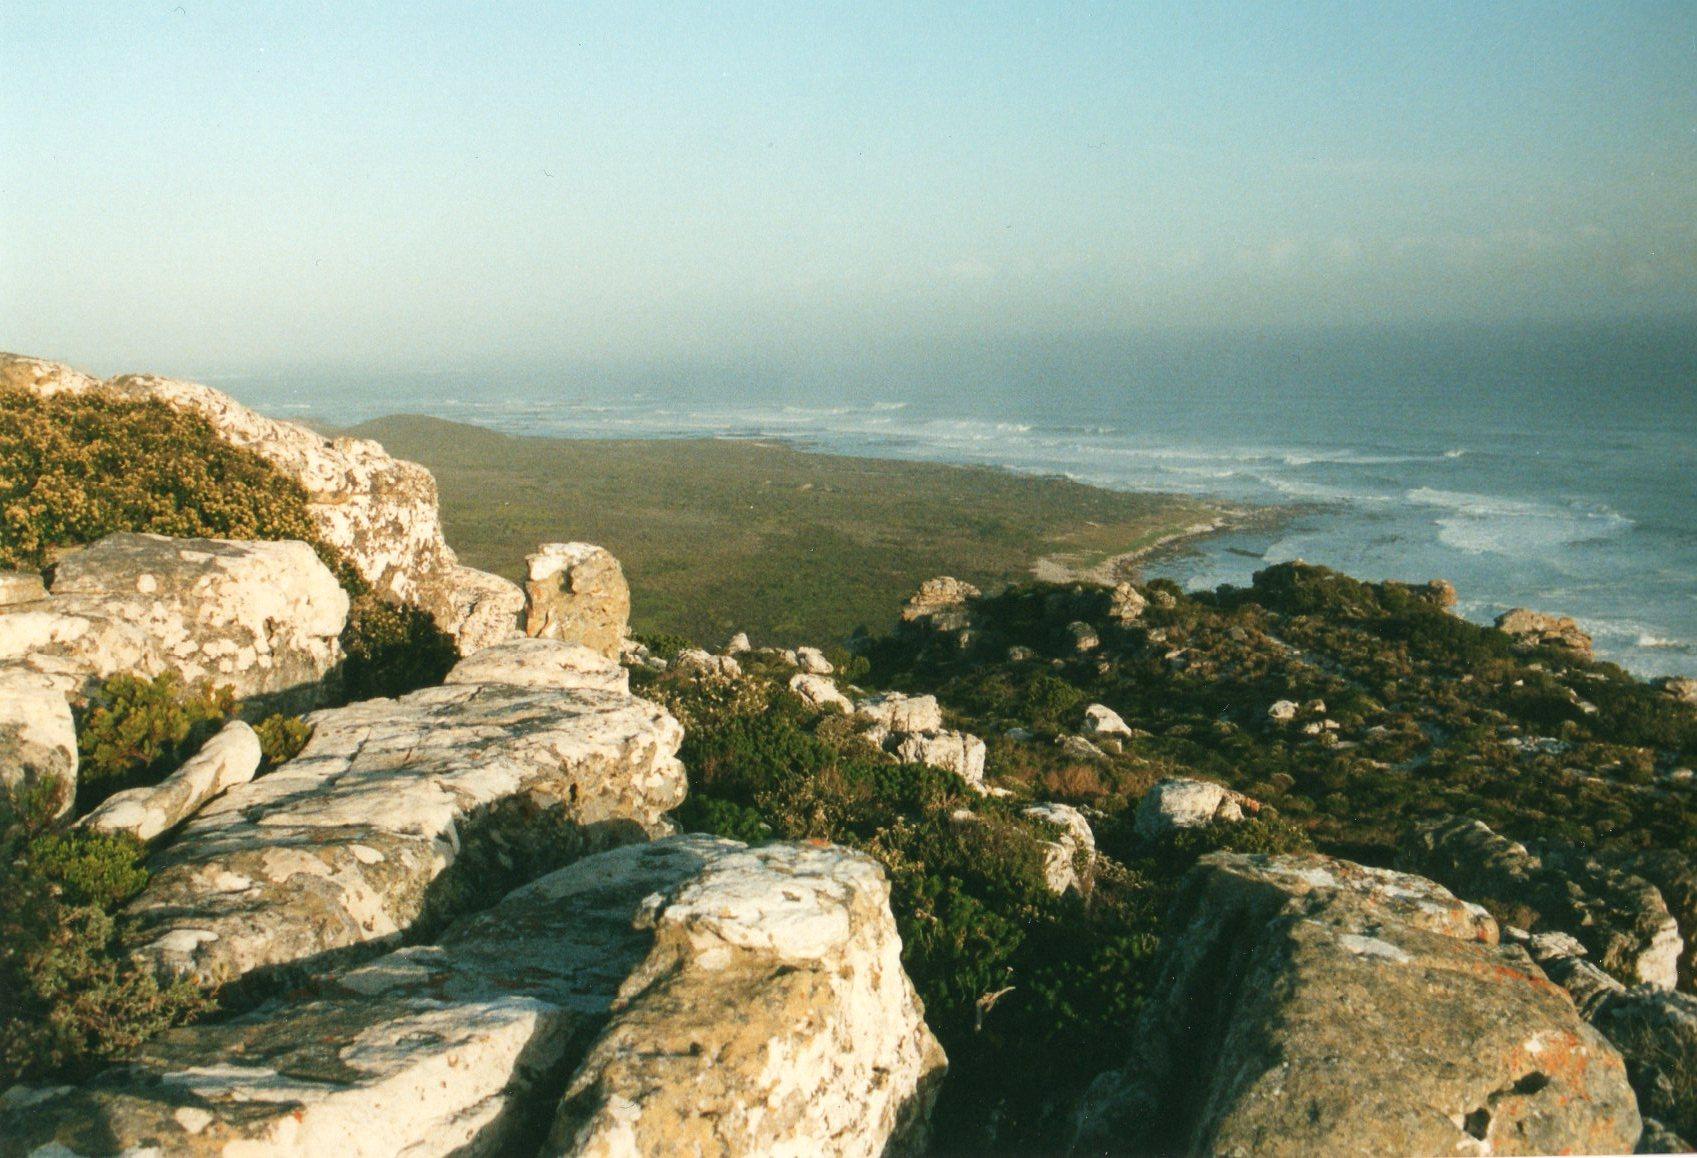 South Africa Western Cape Cape Area, Cape of Good Hope, , Walkopedia